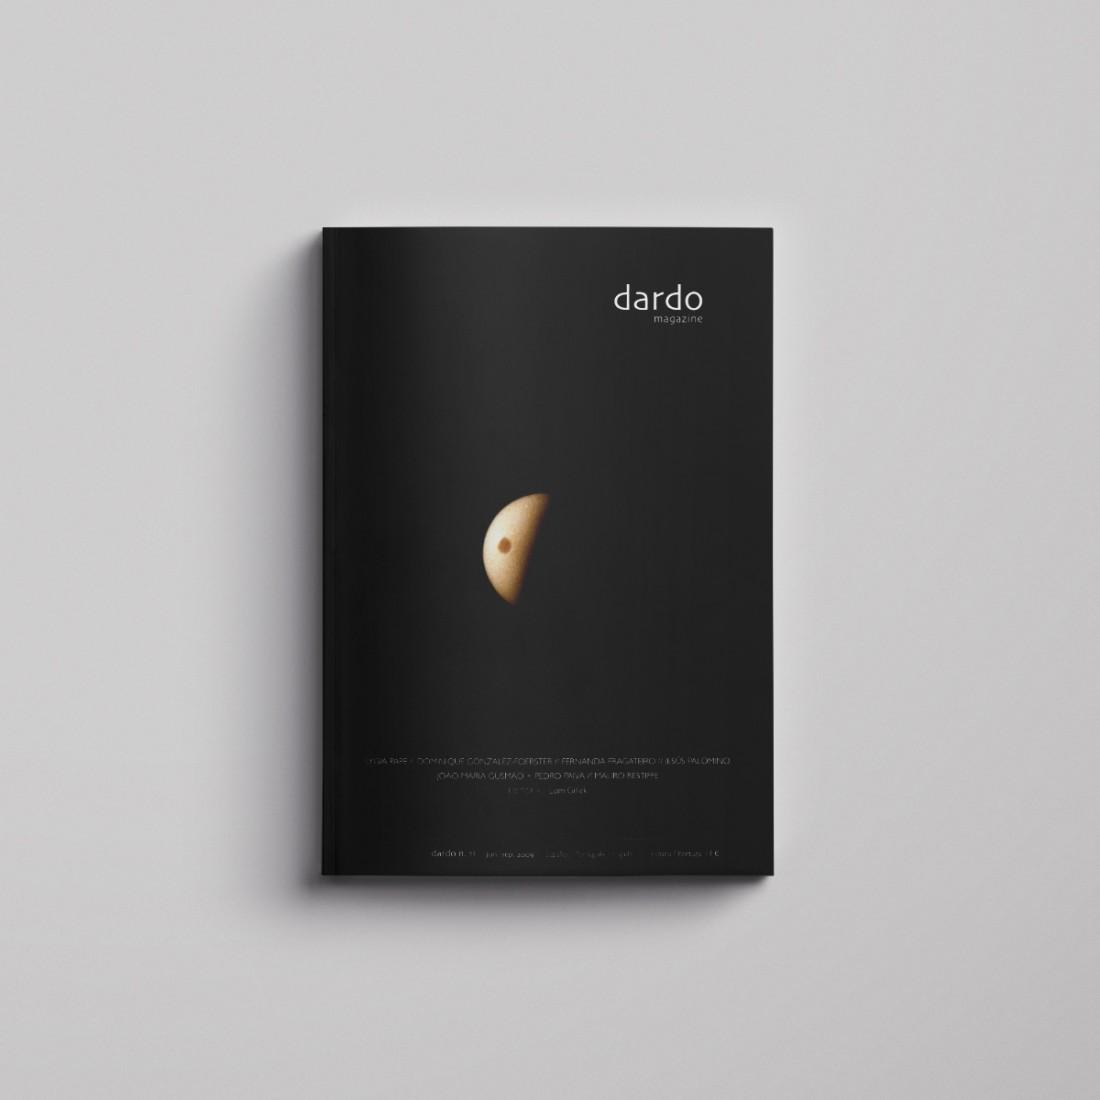 DARDOmagazine 11